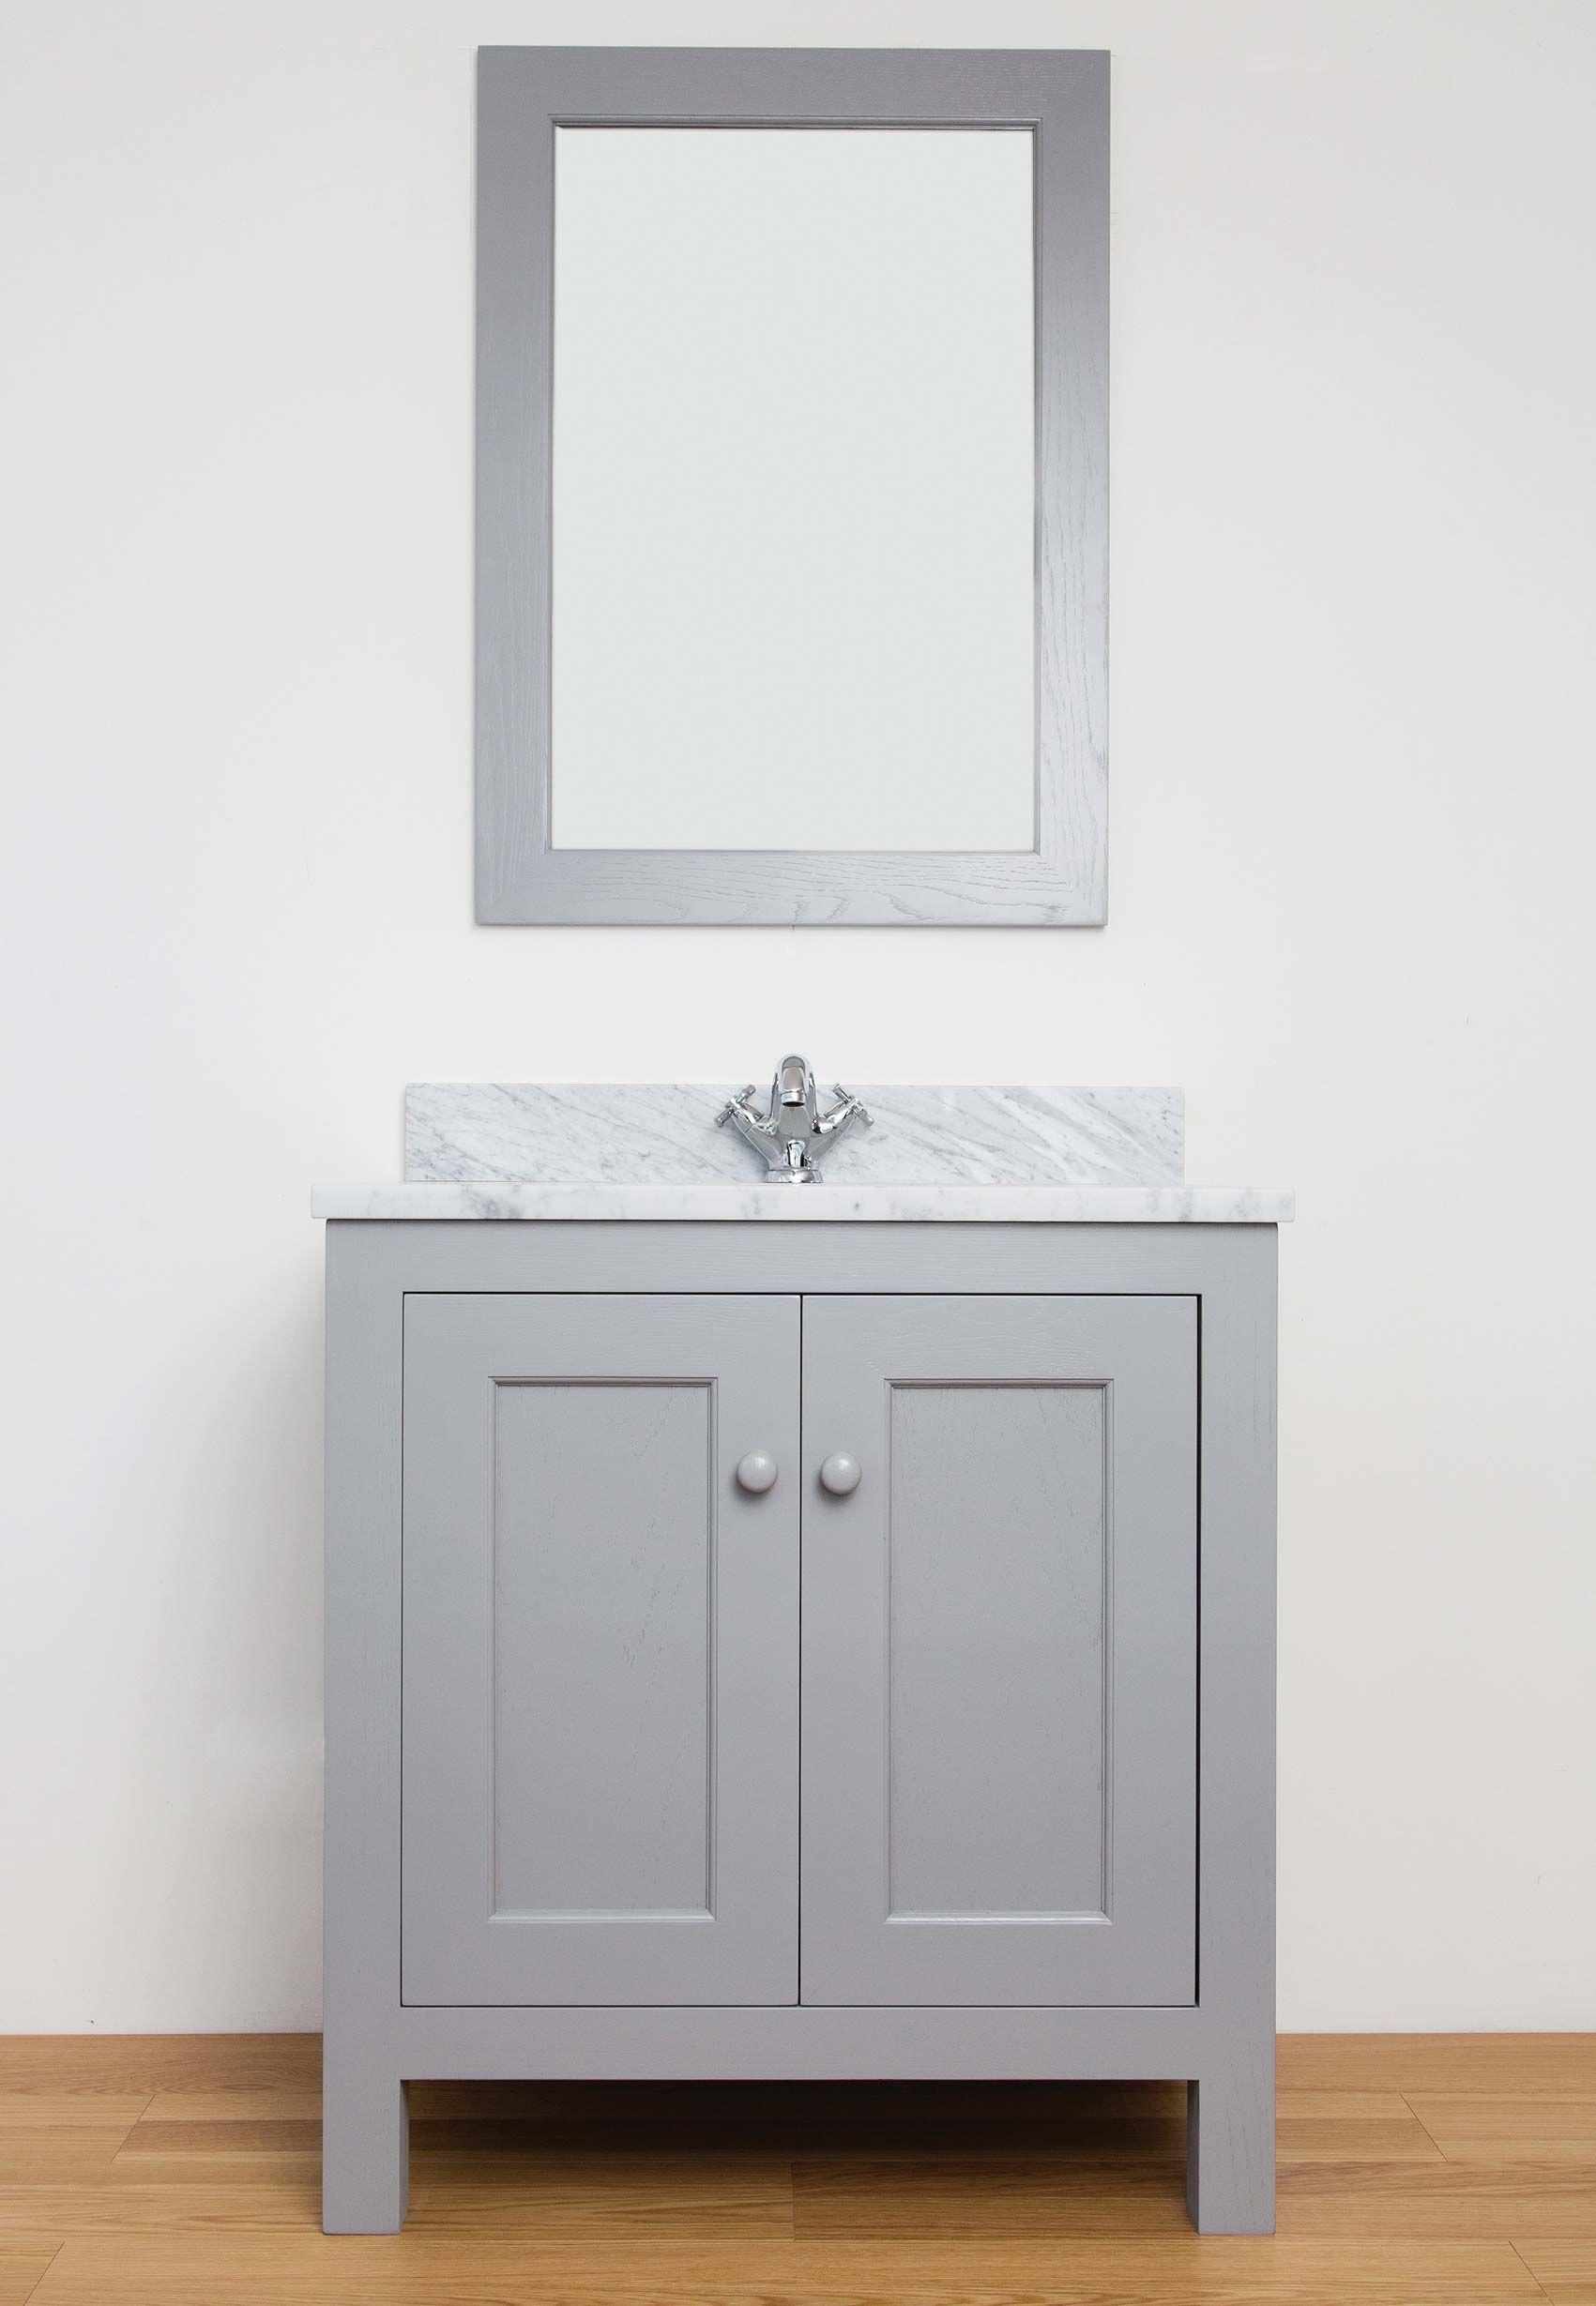 The devon range of painted furniture